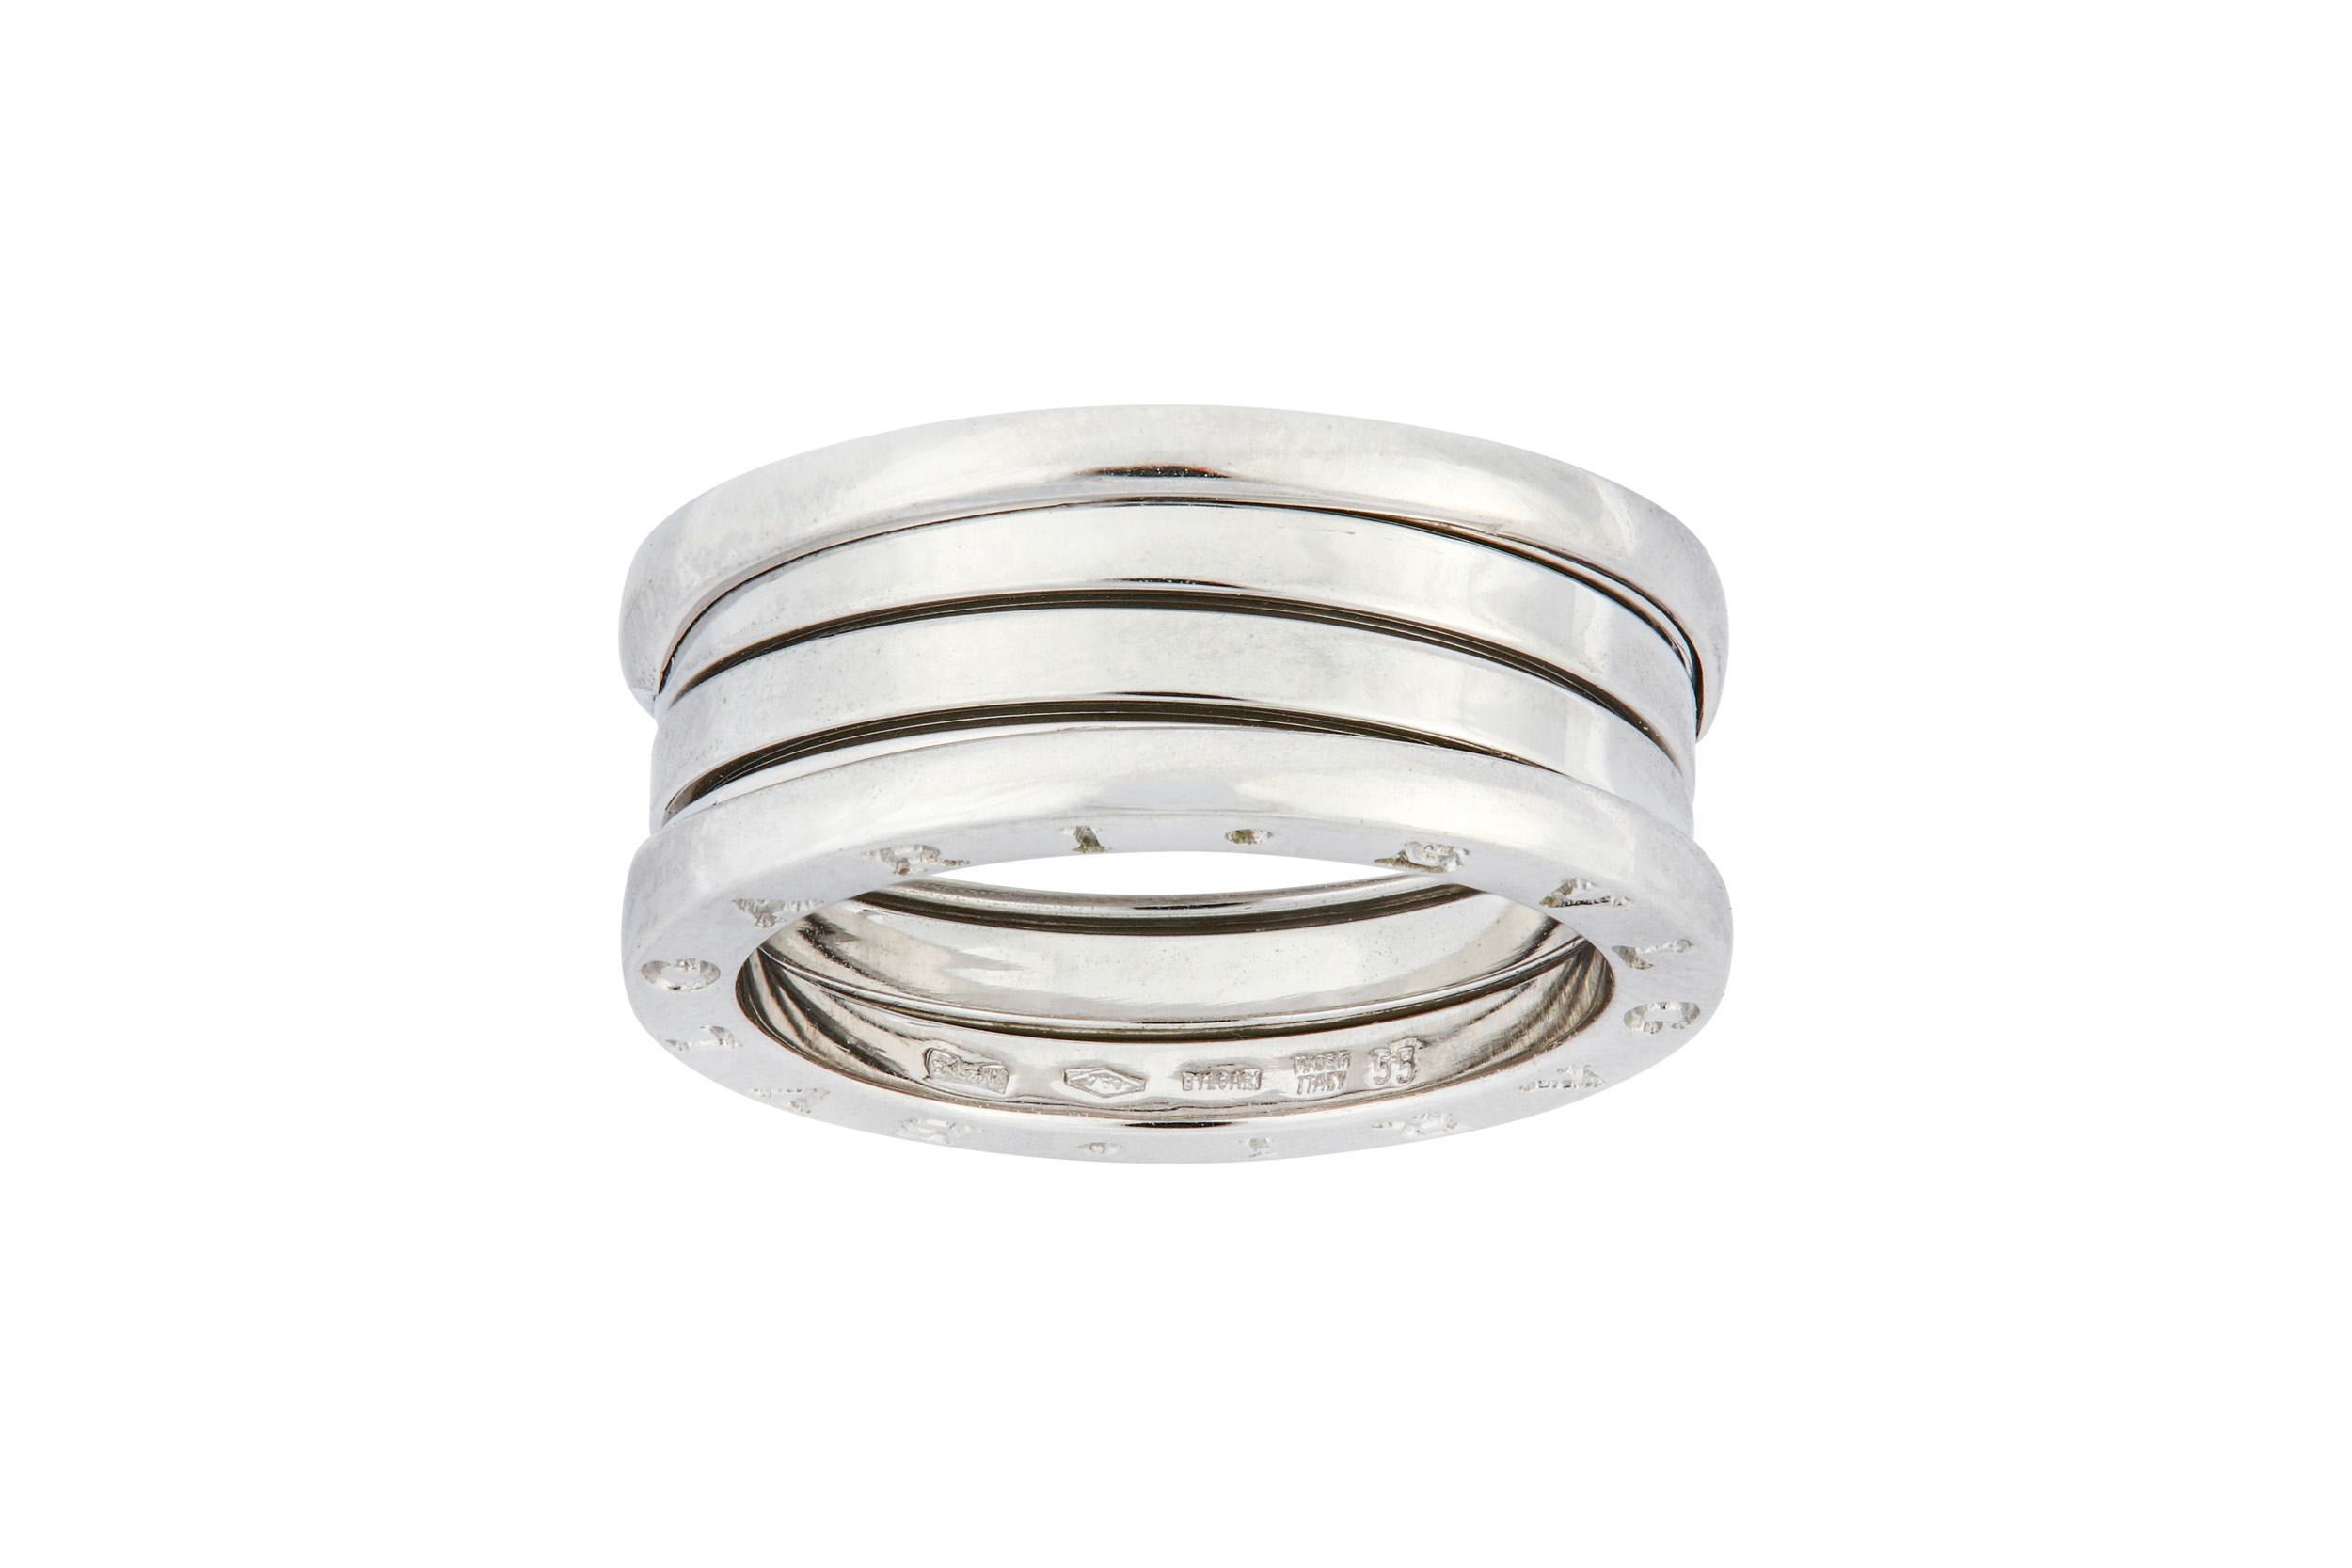 Lot 16 - A B.Zero ring, by Bulgari